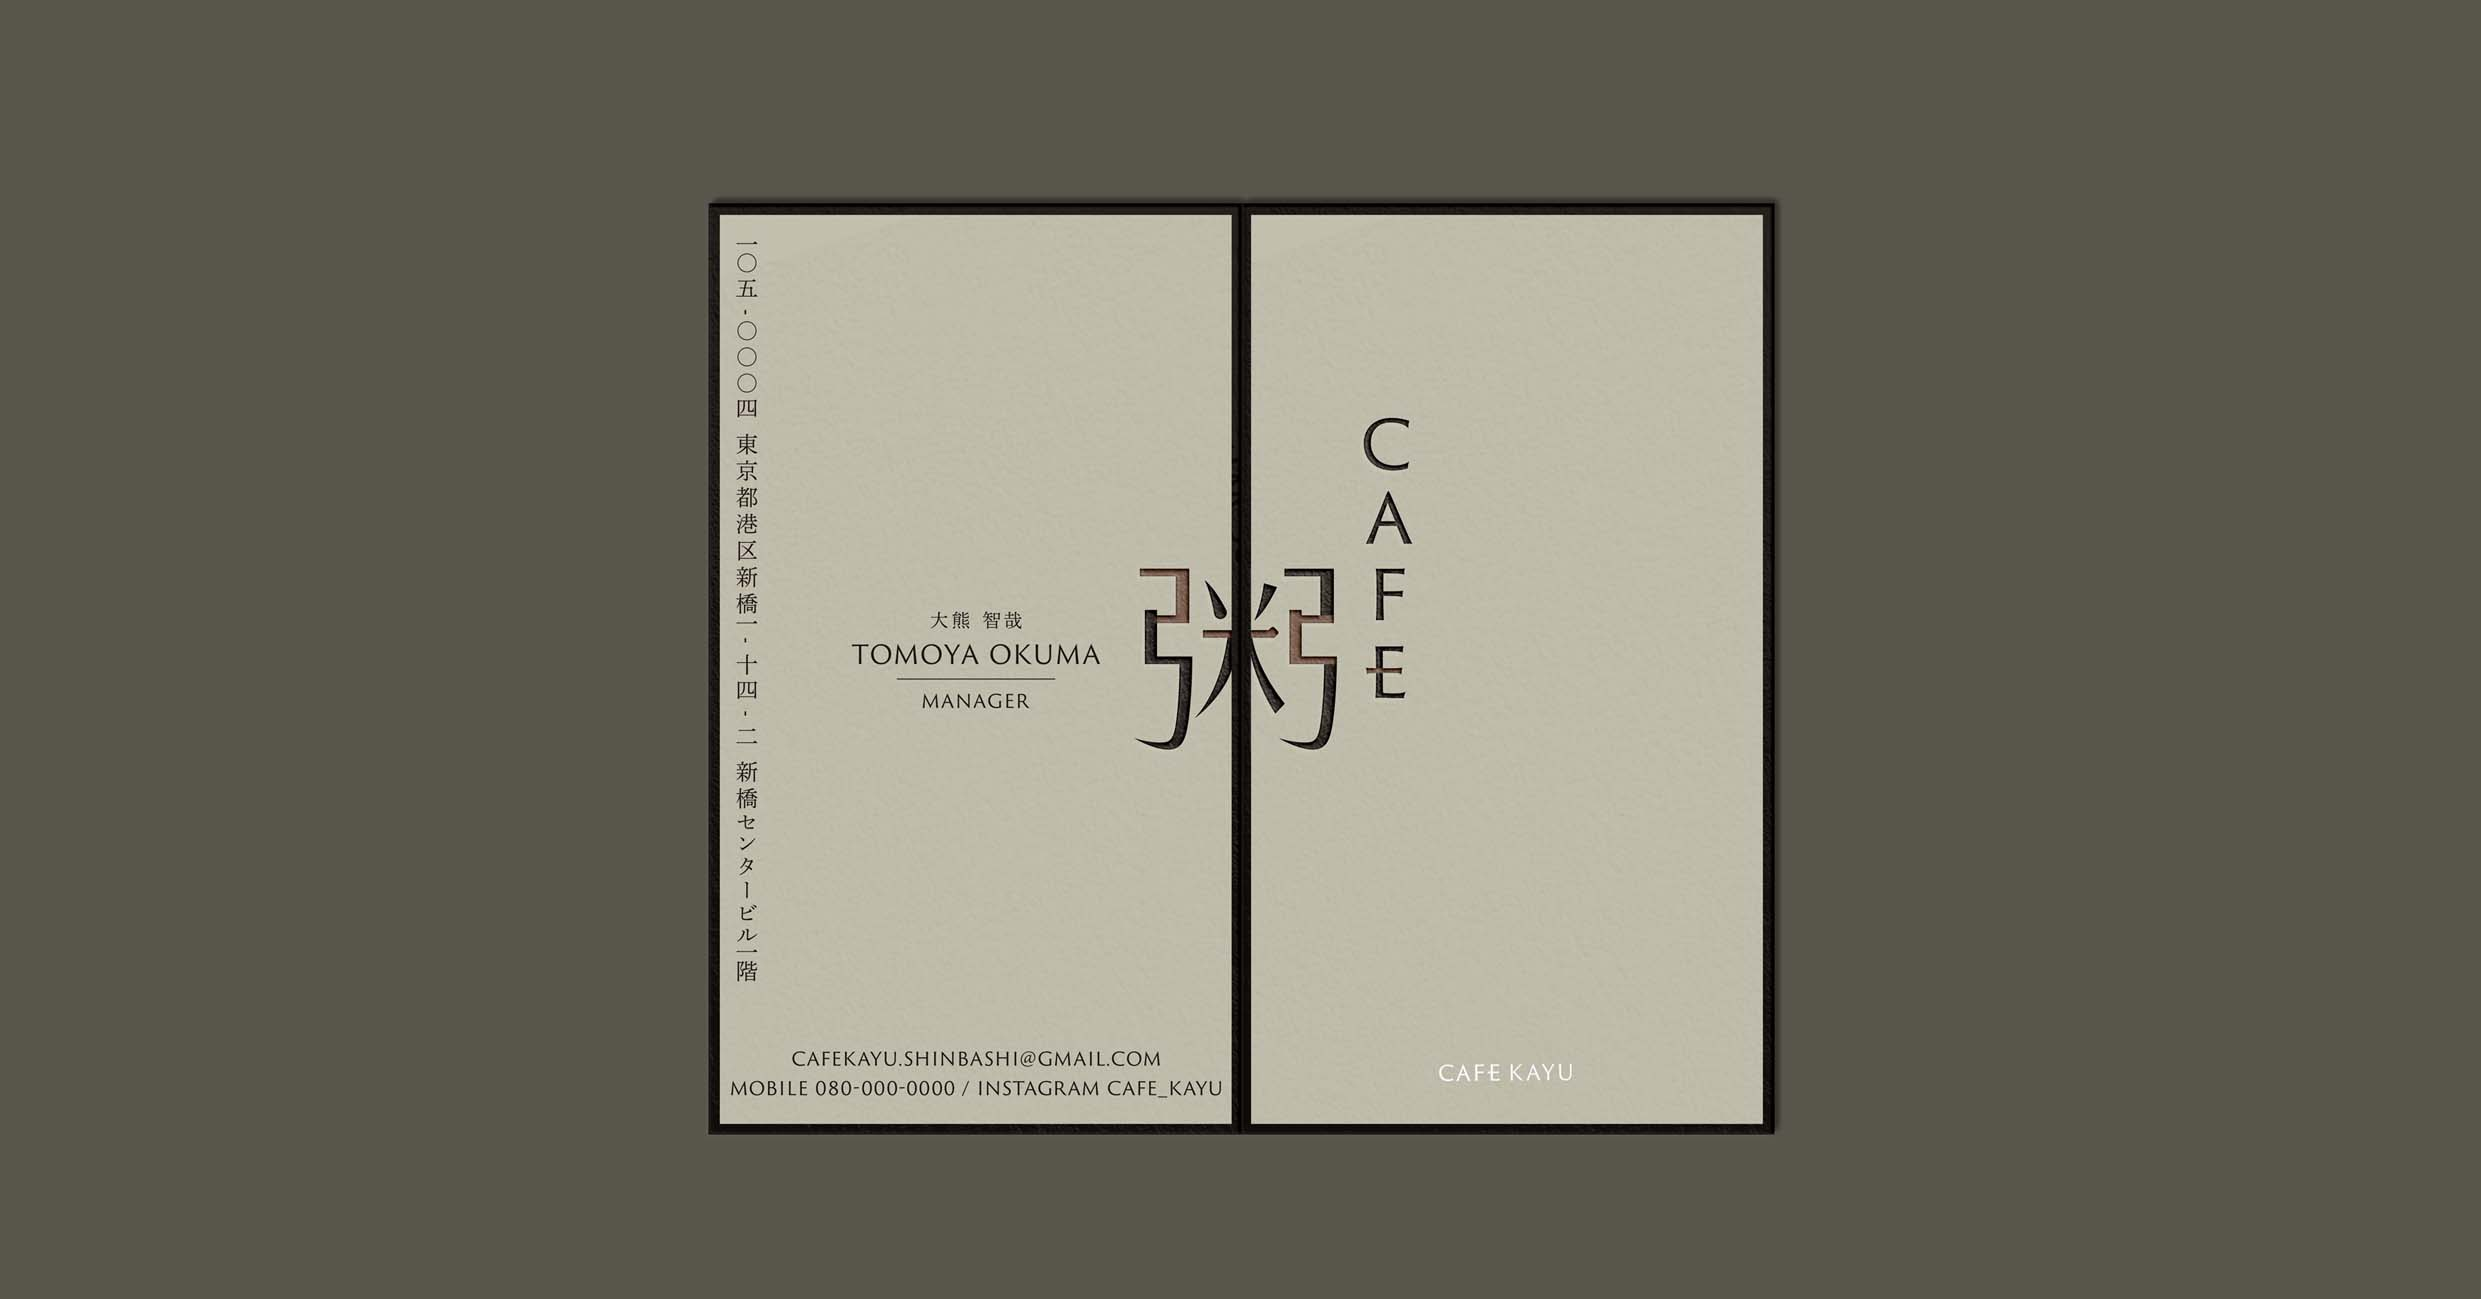 cafe-kayu-businesscard